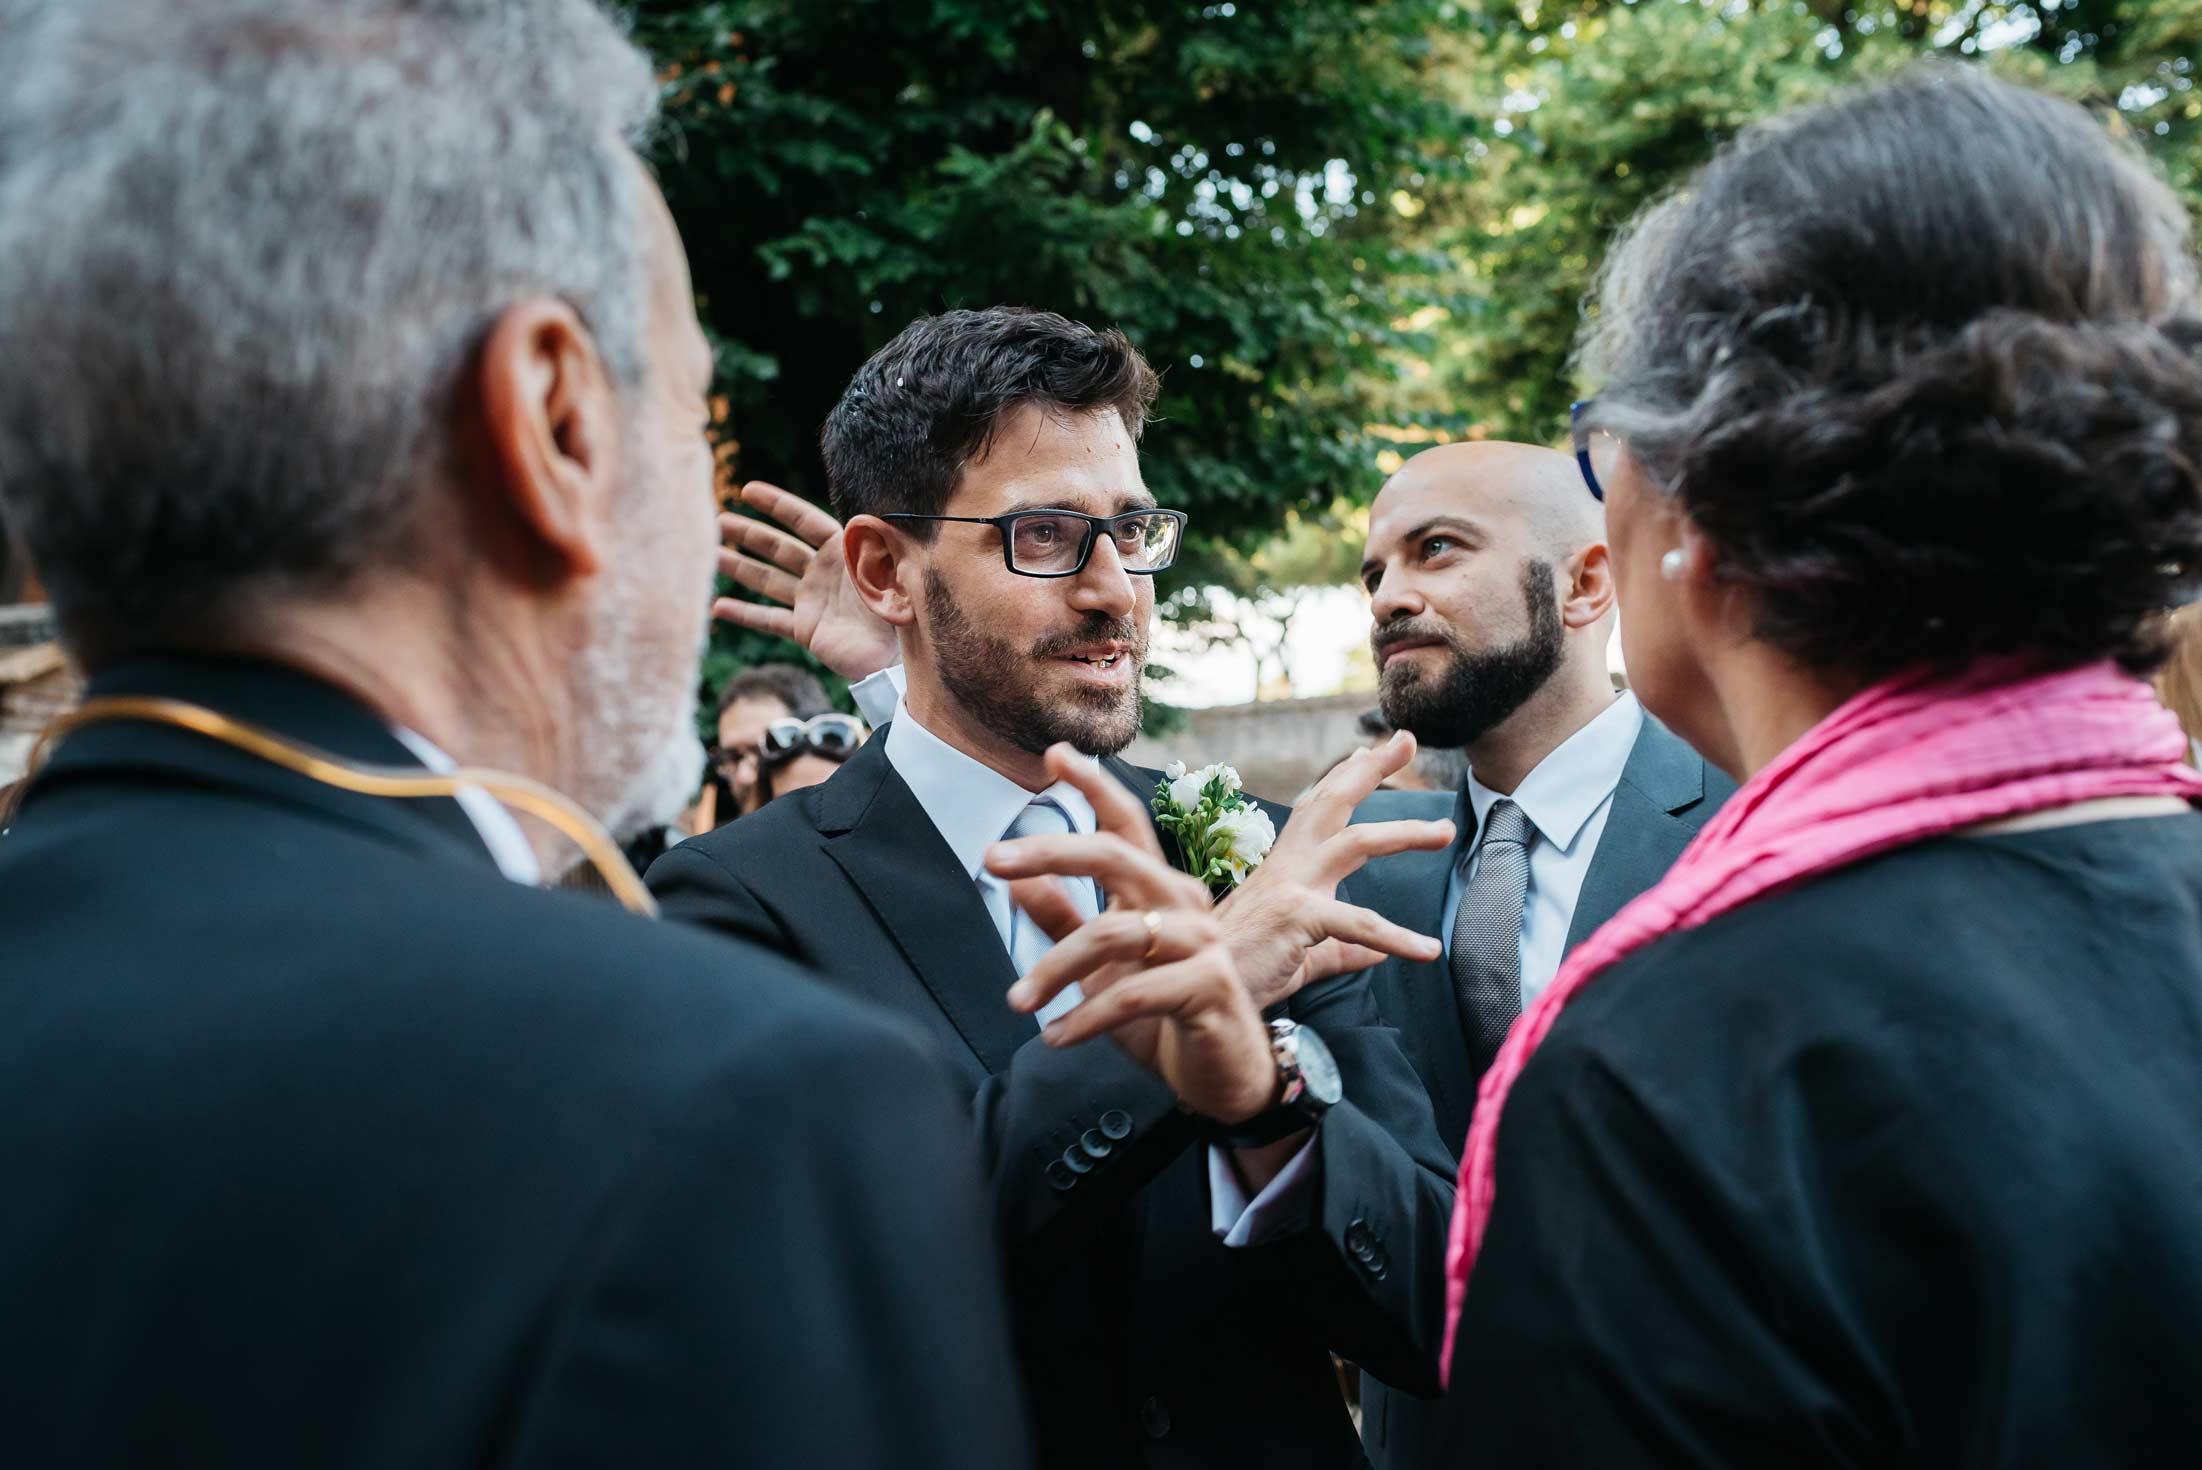 Fotografo-Sposi-Roma-Stile-Reportage-Cerimonia